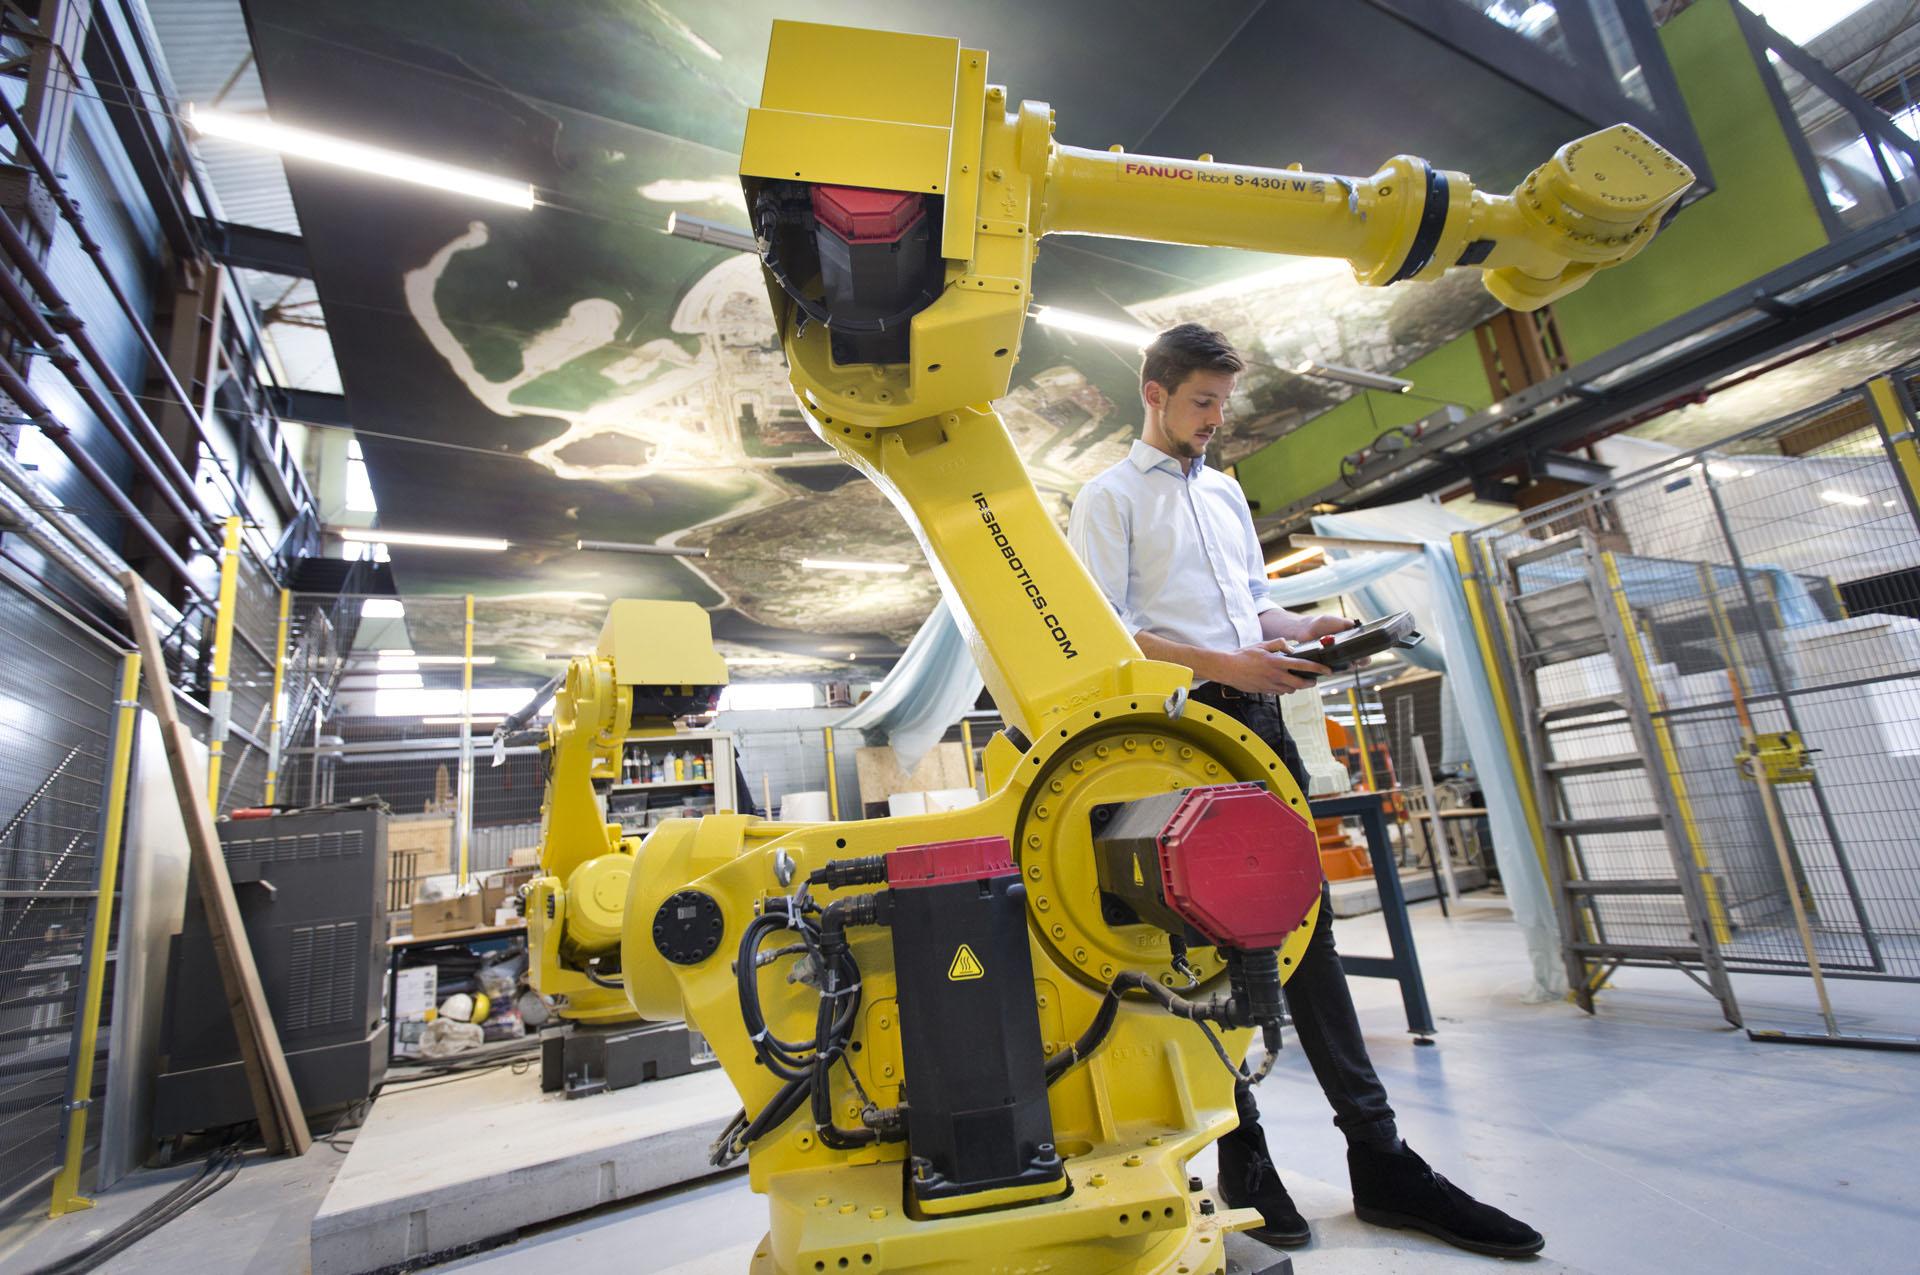 niels robot armen rdm makerspace